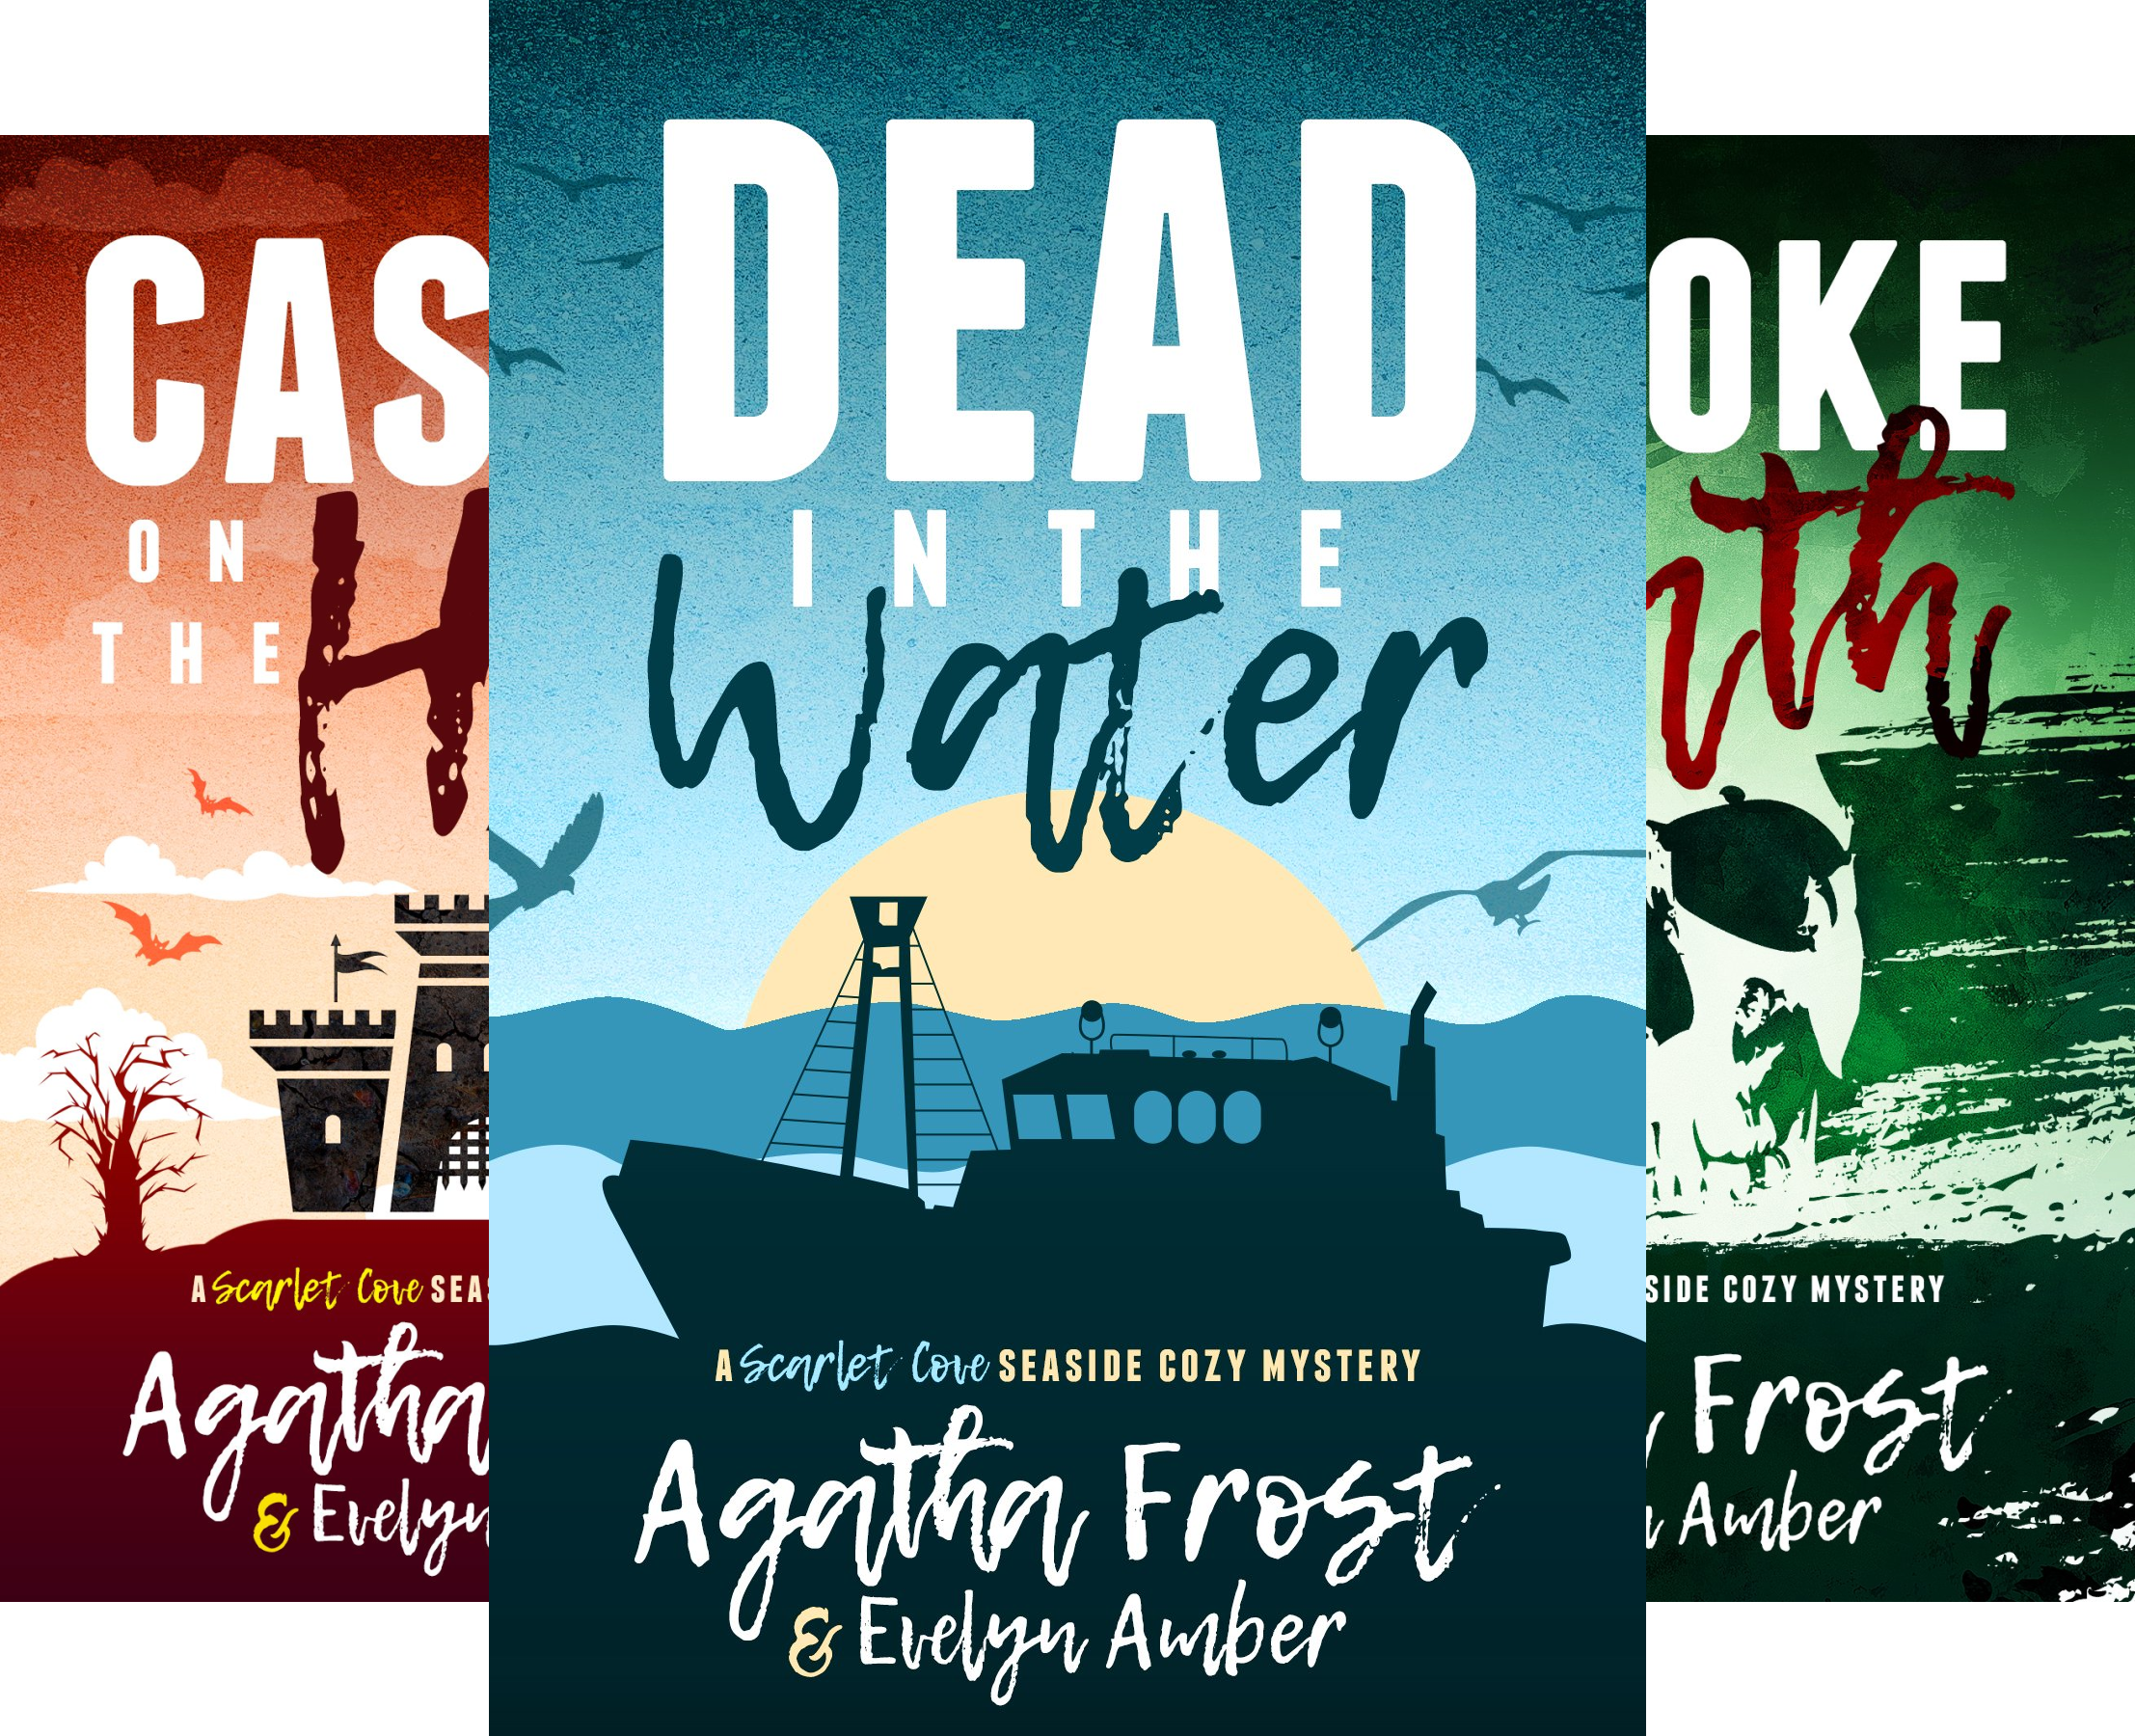 Scarlet Cove Seaside Cozy Mystery (3 Book Series)